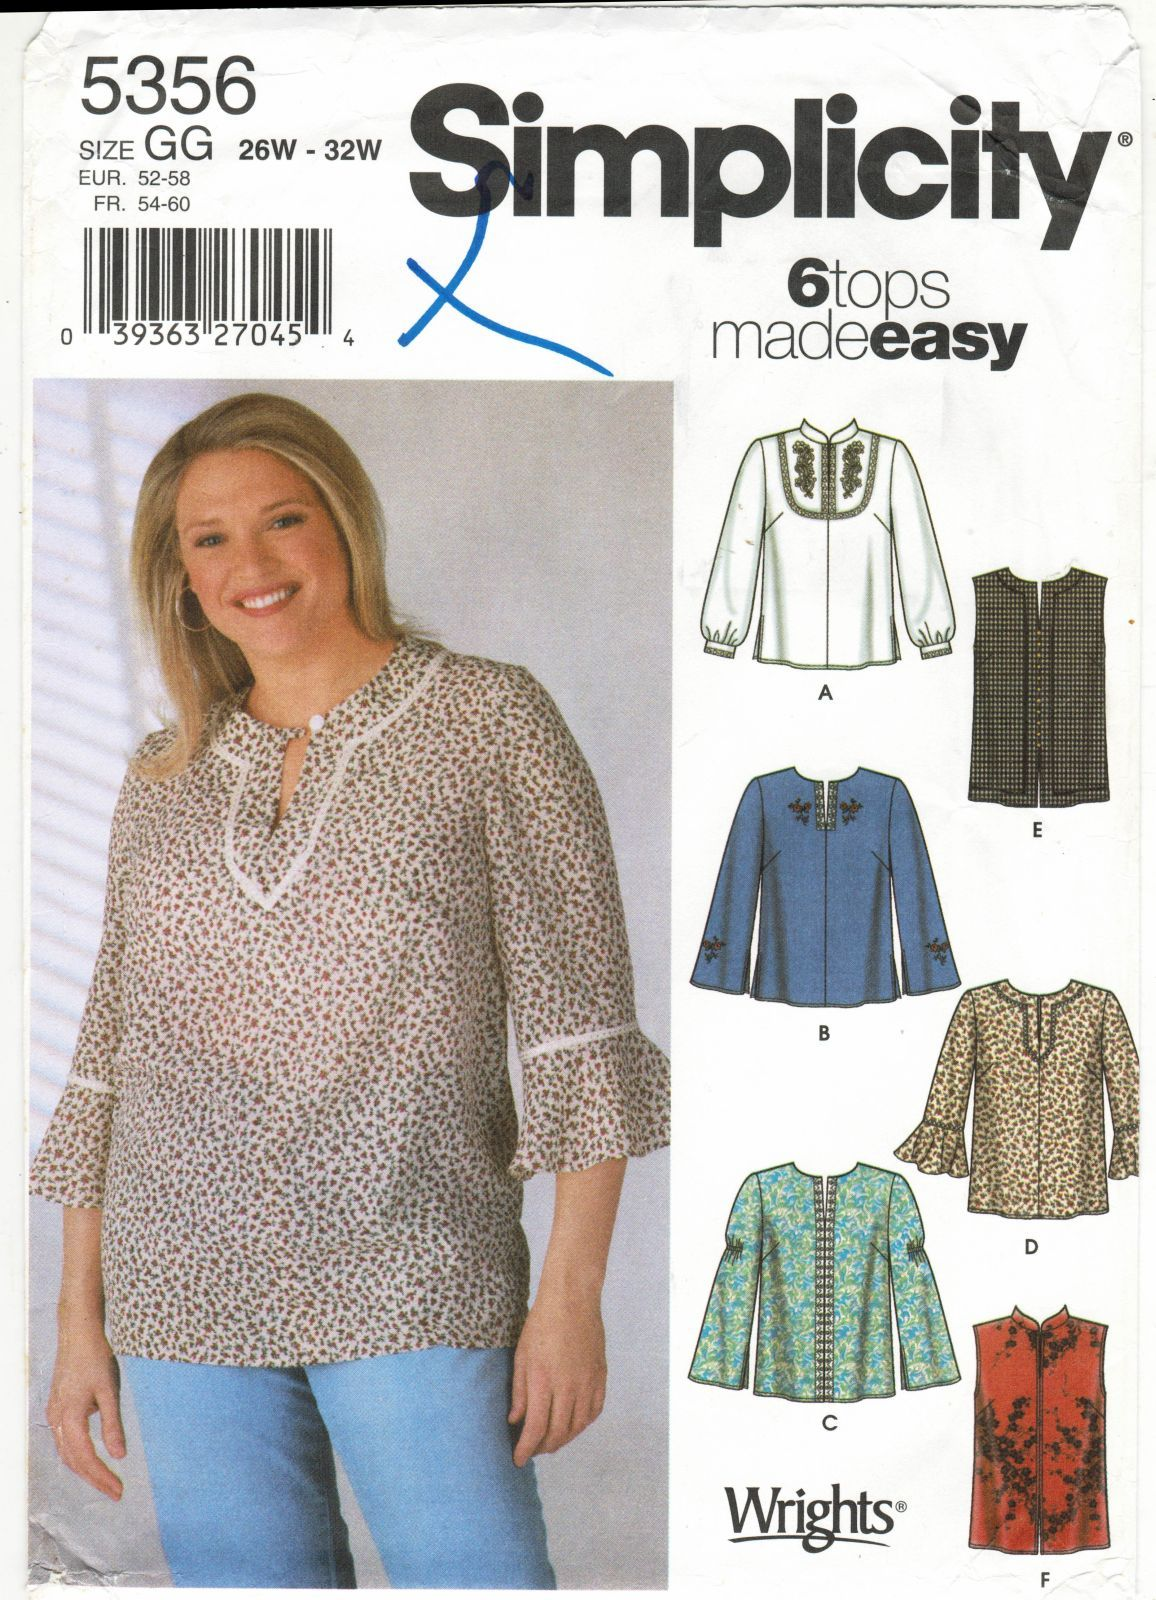 58c5c1814bd4 Womens Plus Size Loose Fit Boho Peasant Tops Mandarin Collar Sew Pattern  26W-32W